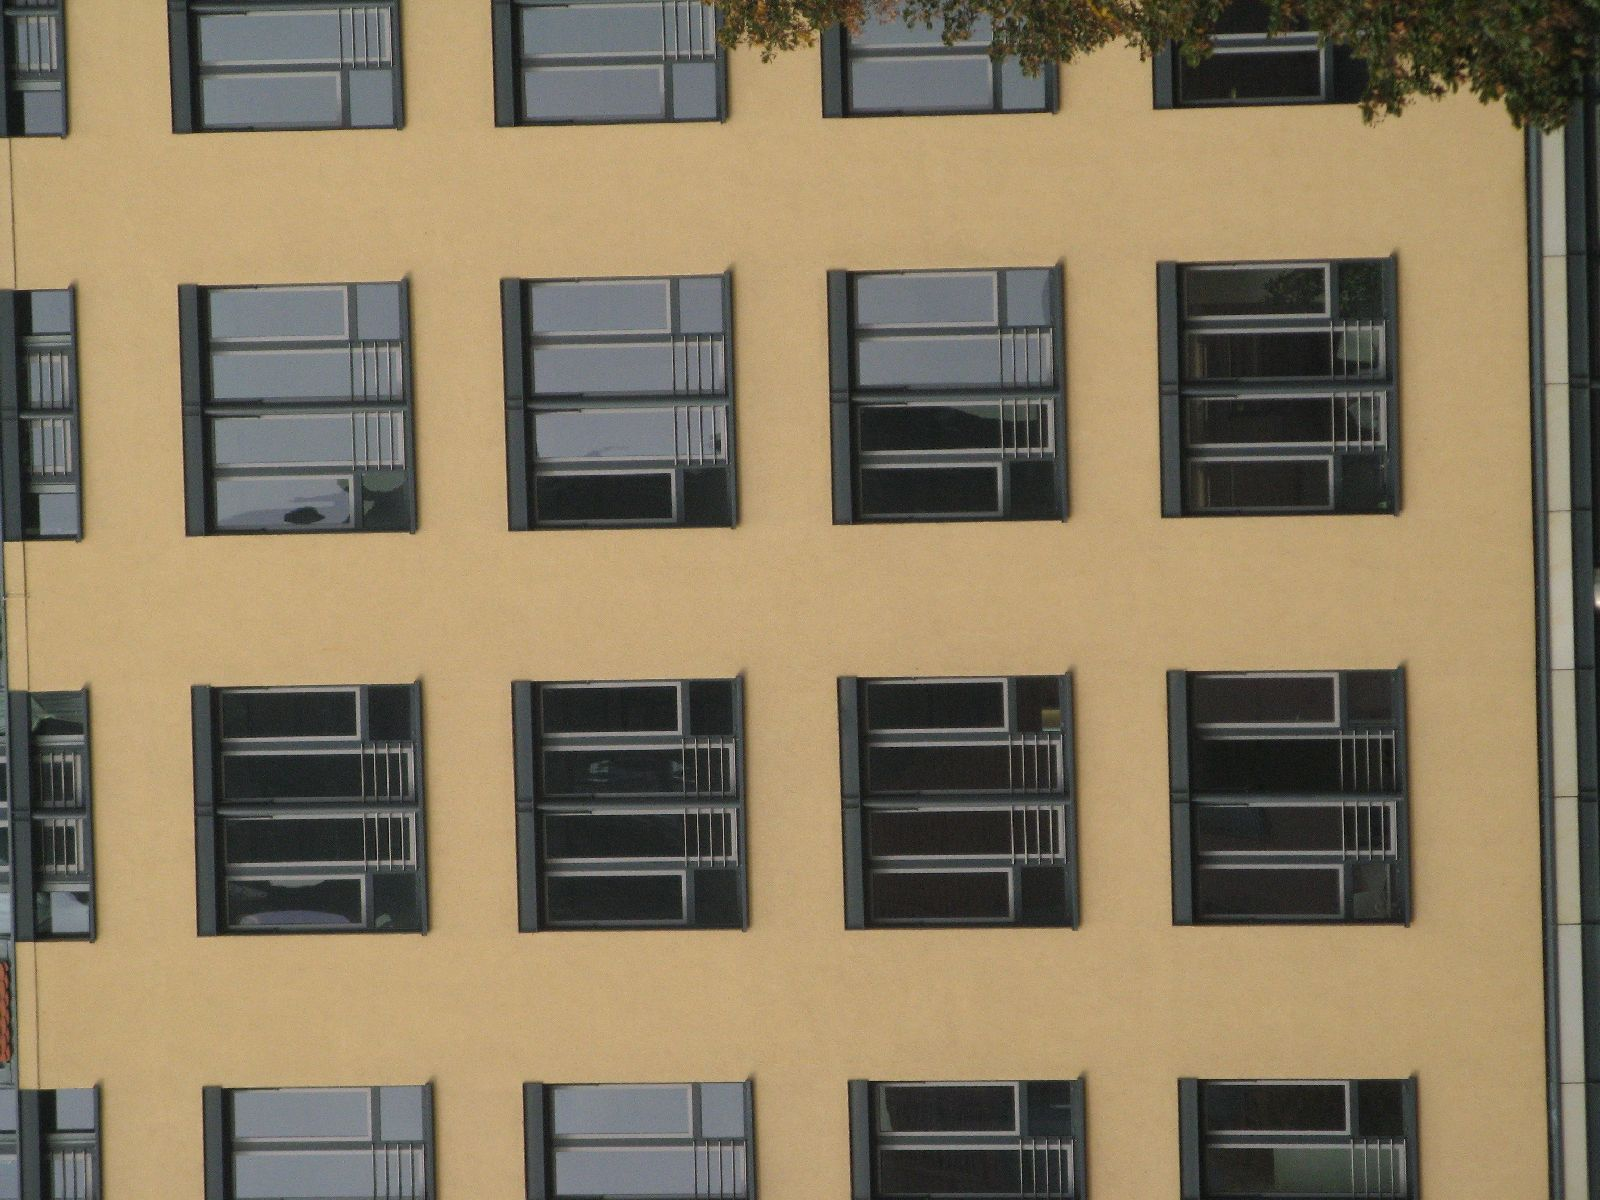 Building_Texture_B_3570